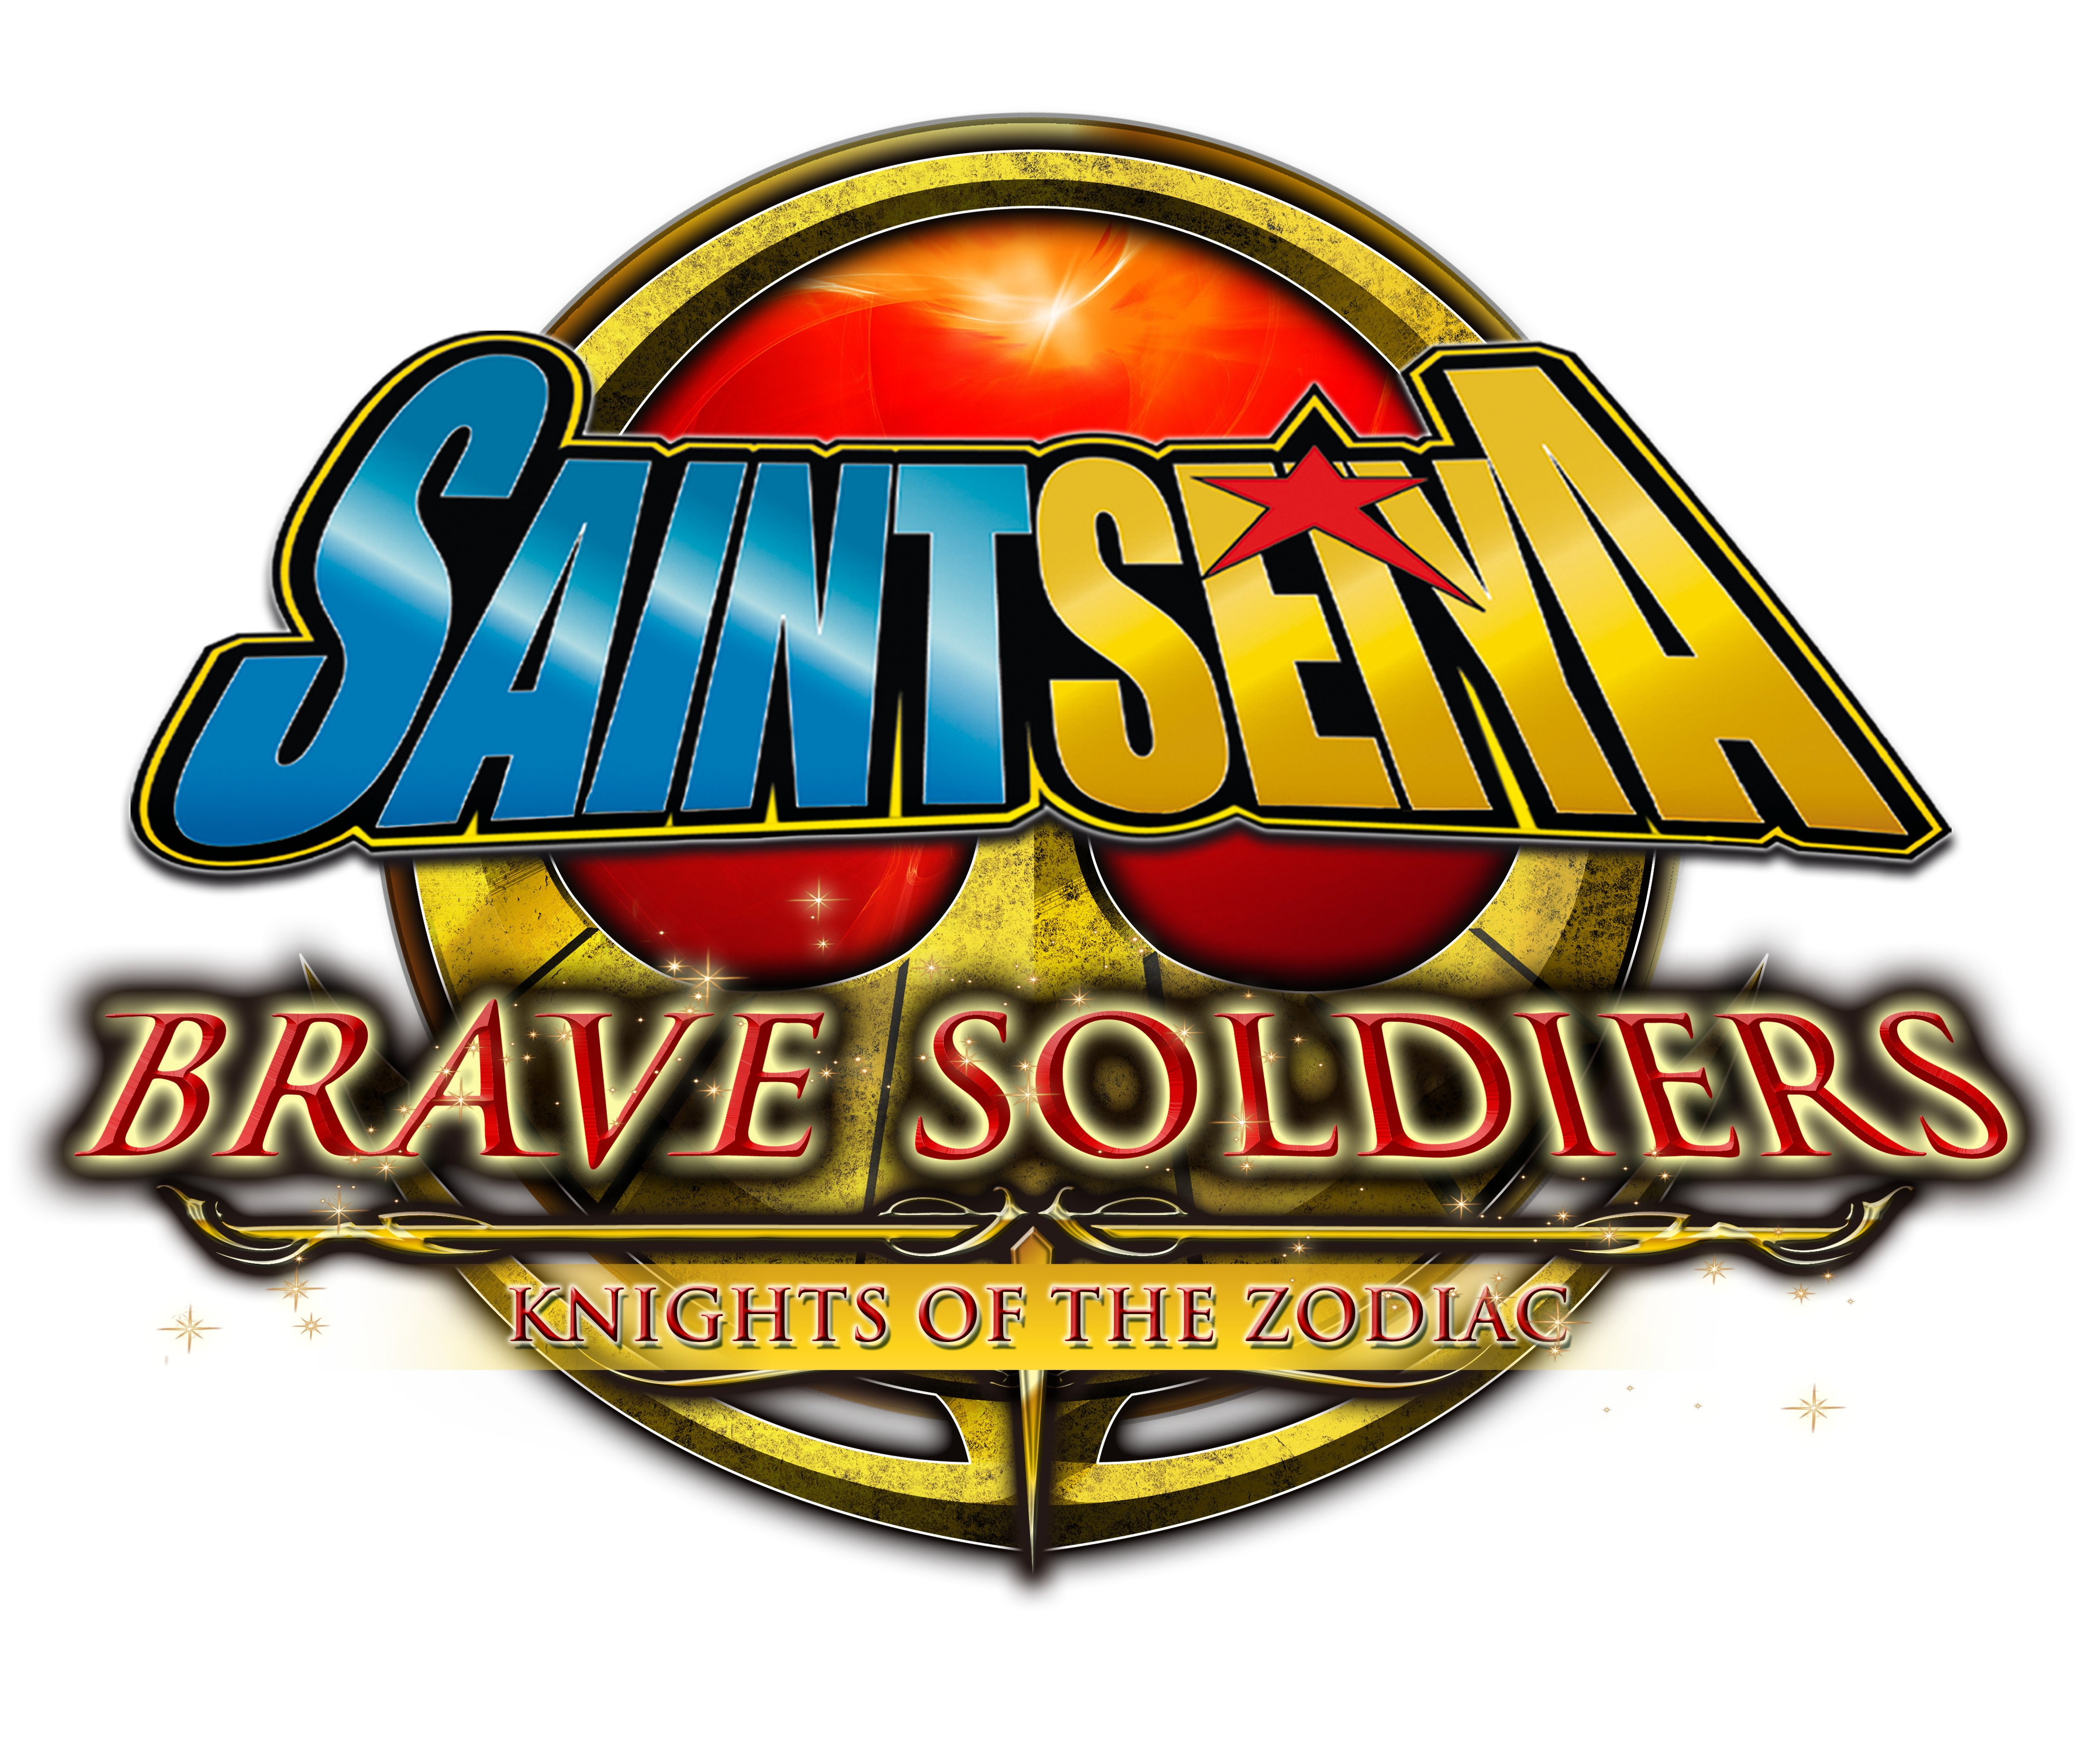 Imágenes En General de Los personajes del Brave Soldier BmUploads_2013-07-03_3656_Saint-Seiya-Brave-Soldiers-EMEA-Logo